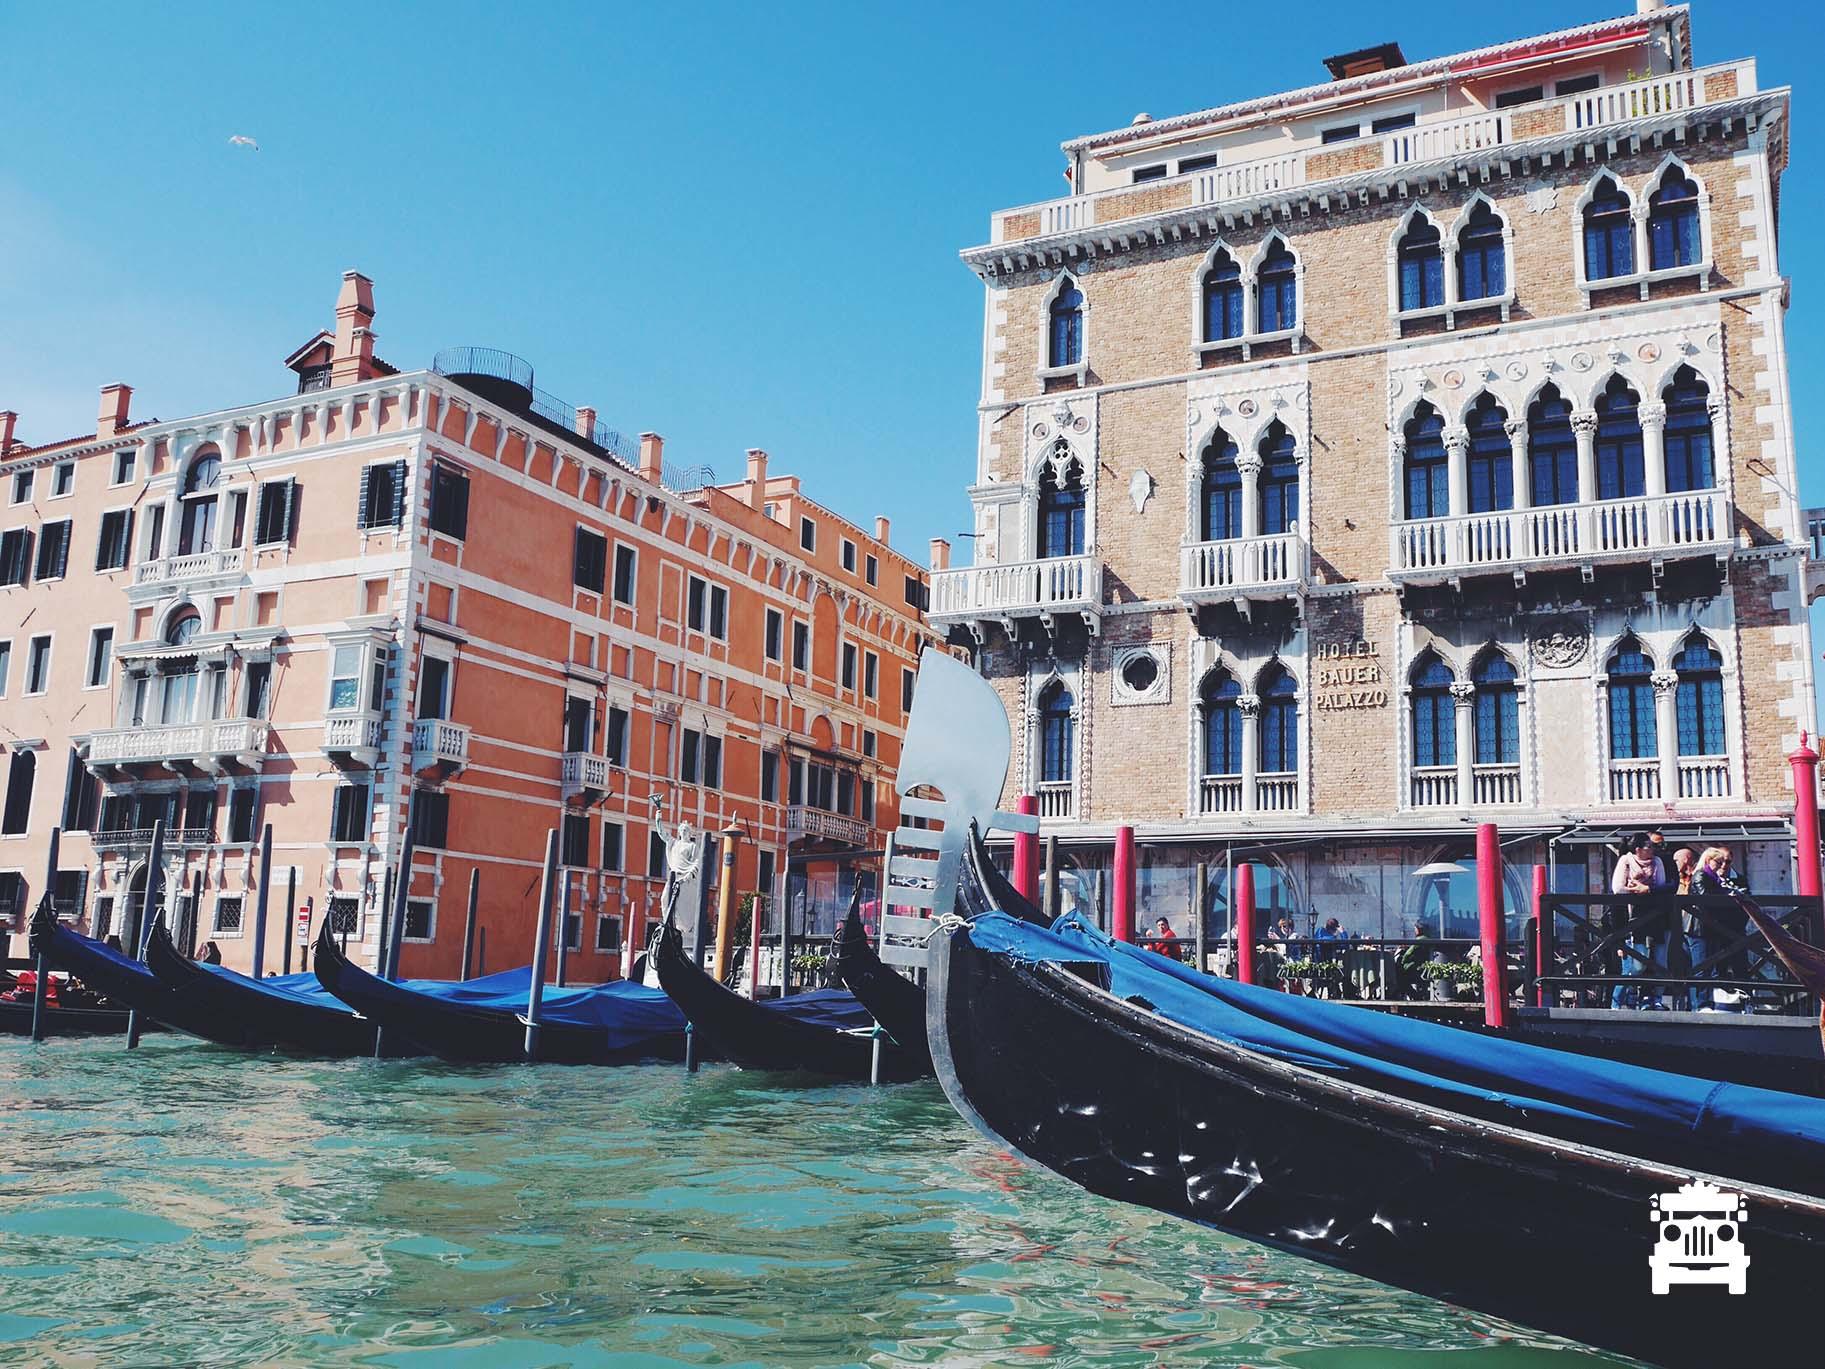 Gondolas on the shore